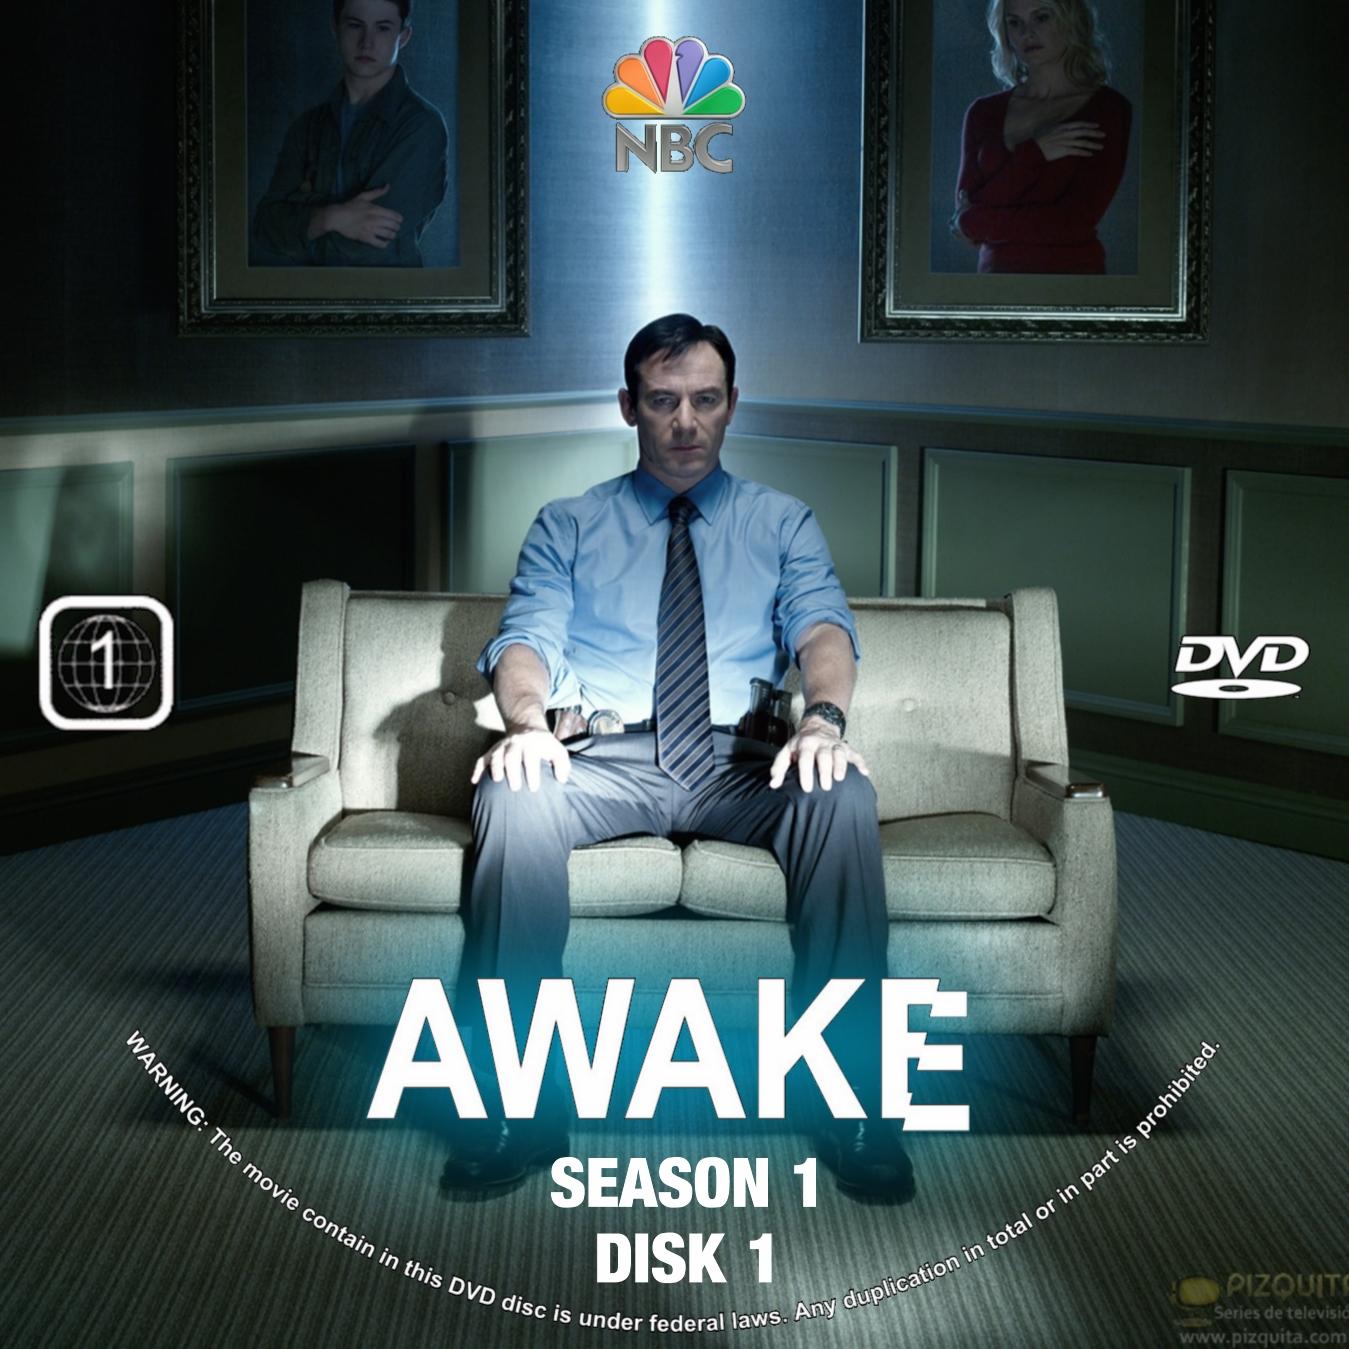 Awake: Season 1